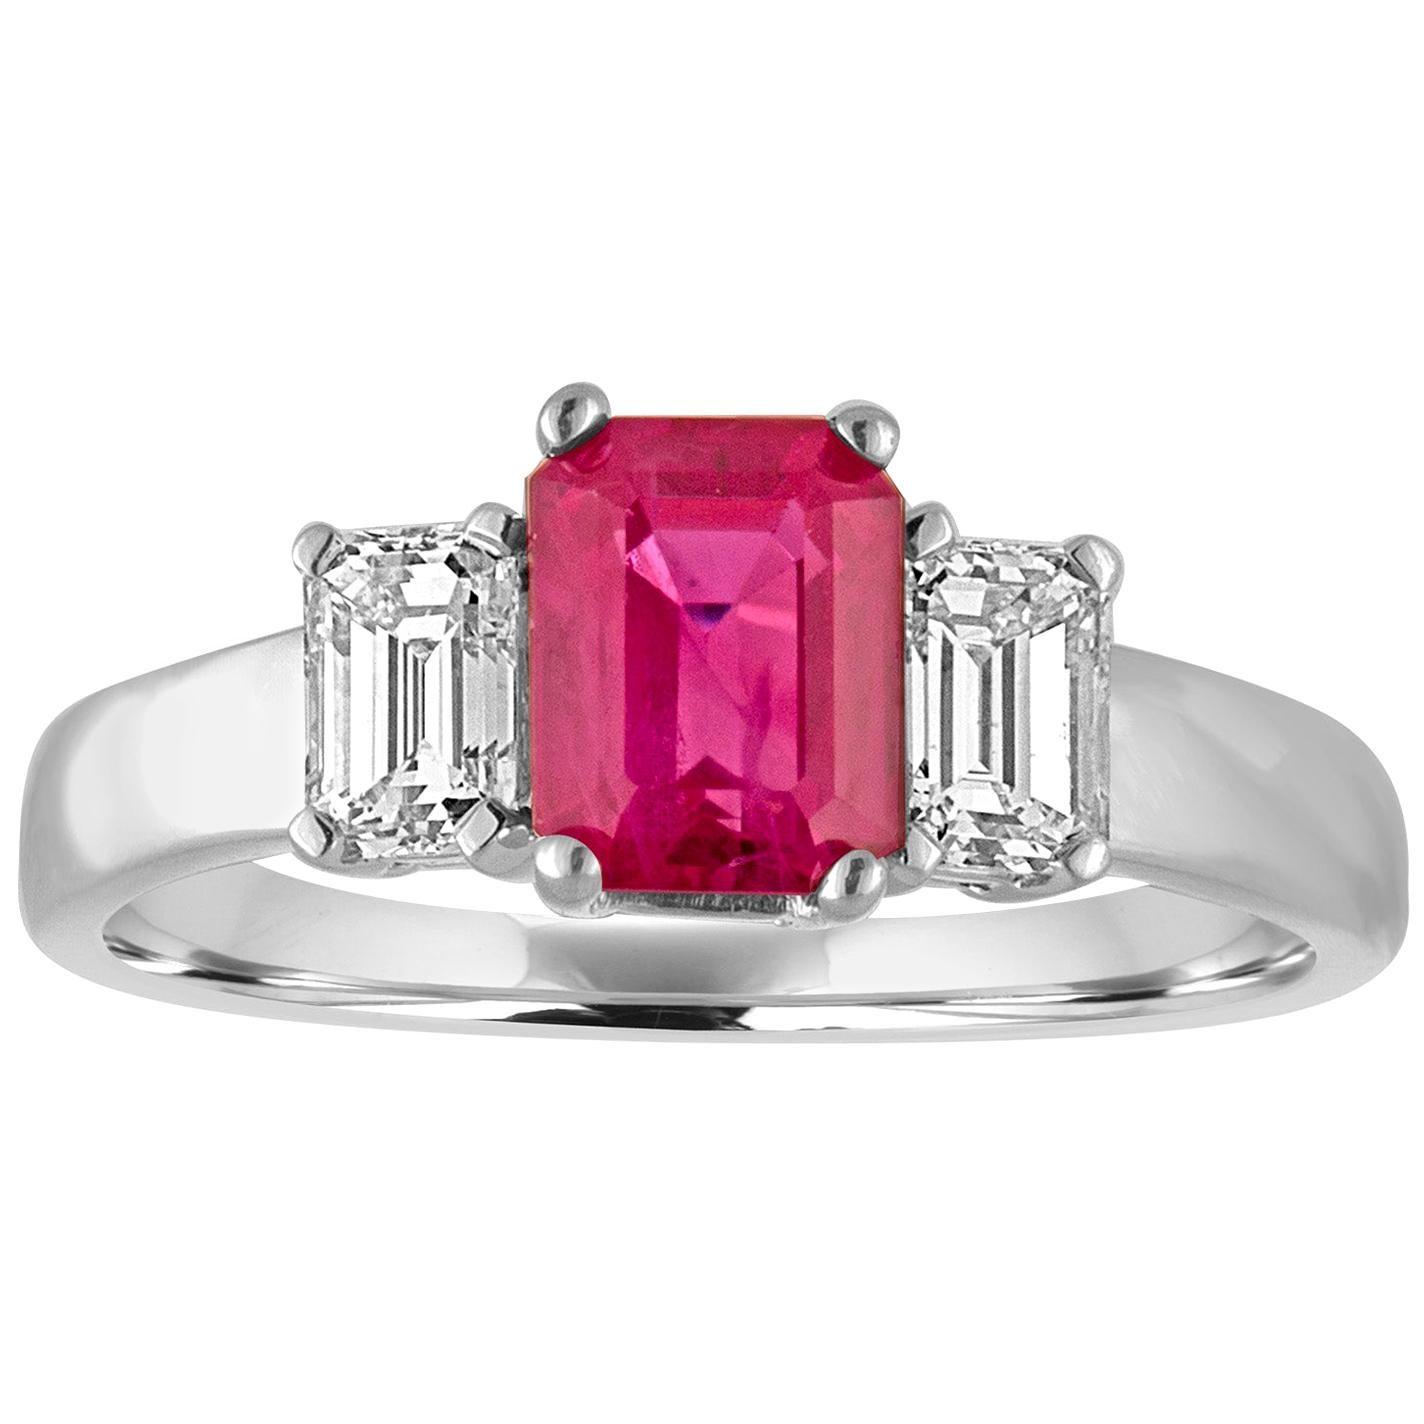 AGL and IGI Certified 1.27 Carat Burma Ruby Three-Stone Diamond Gold Ring